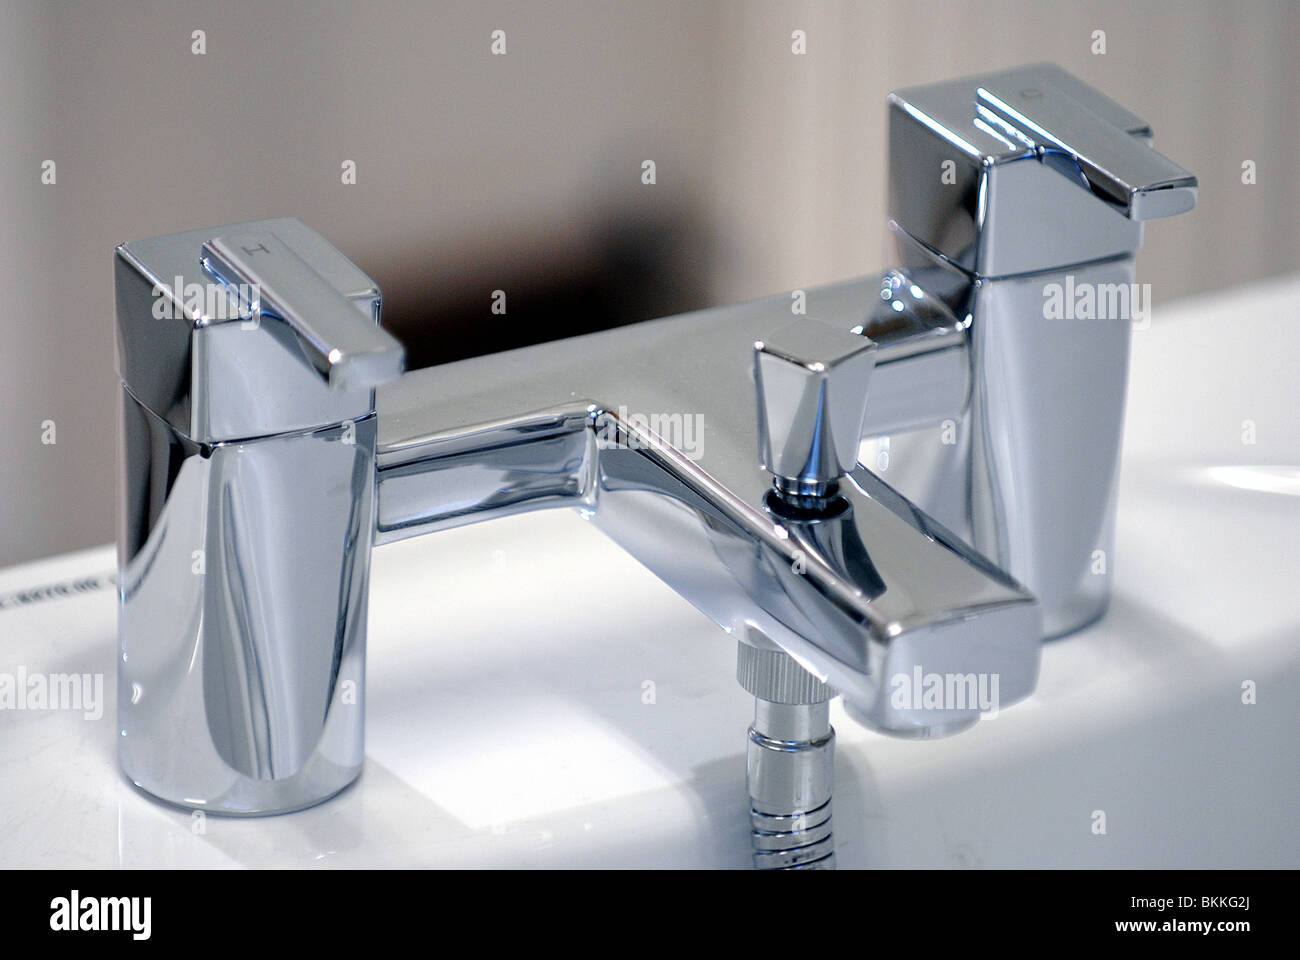 Modern Bathroom mixer tap Stock Photo: 29318538 - Alamy